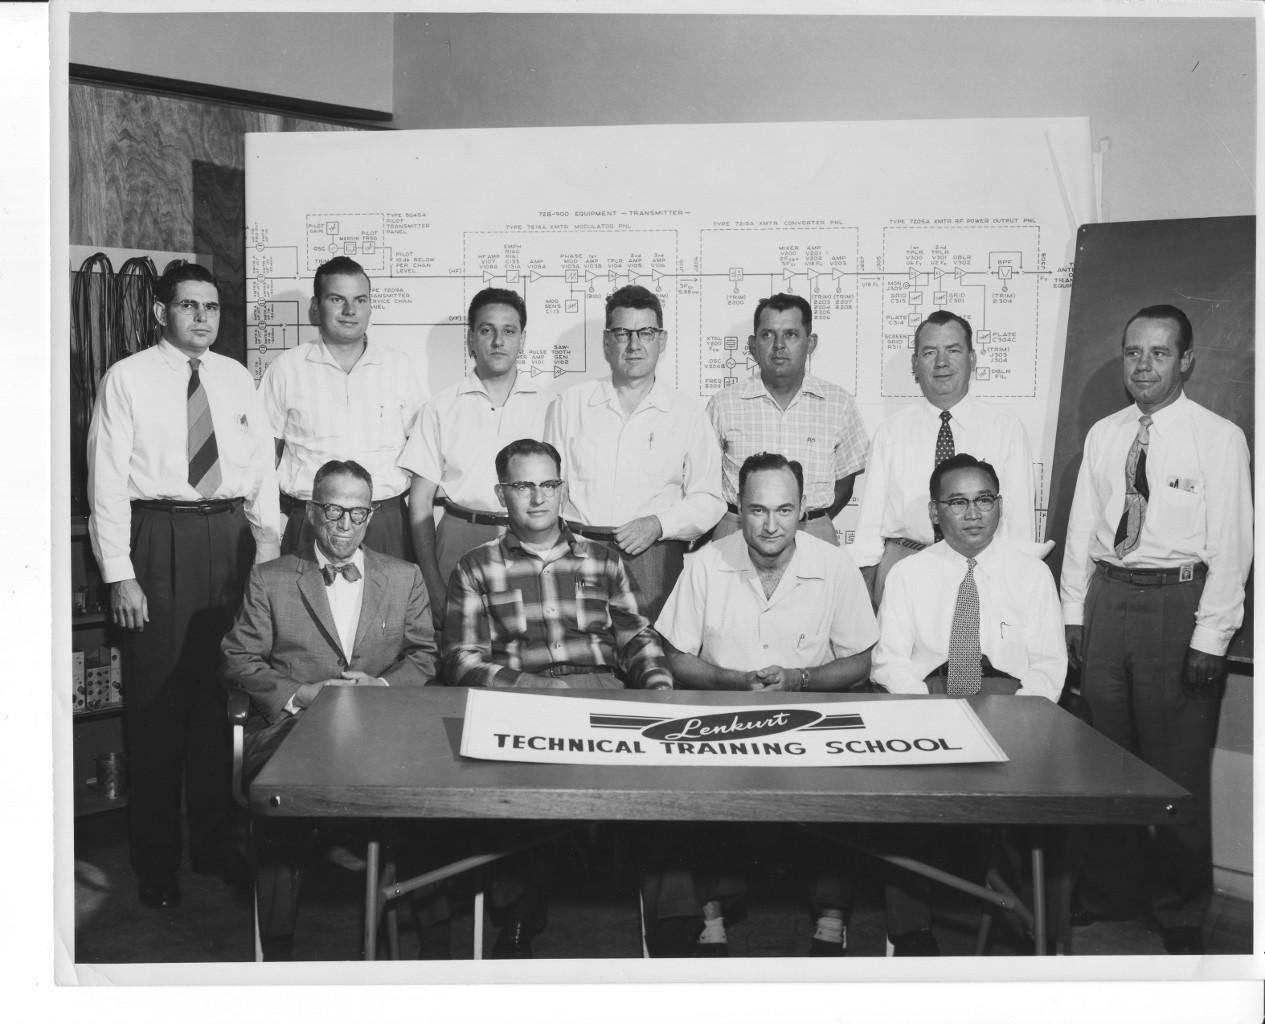 Lenkurt Technical Training School  1950